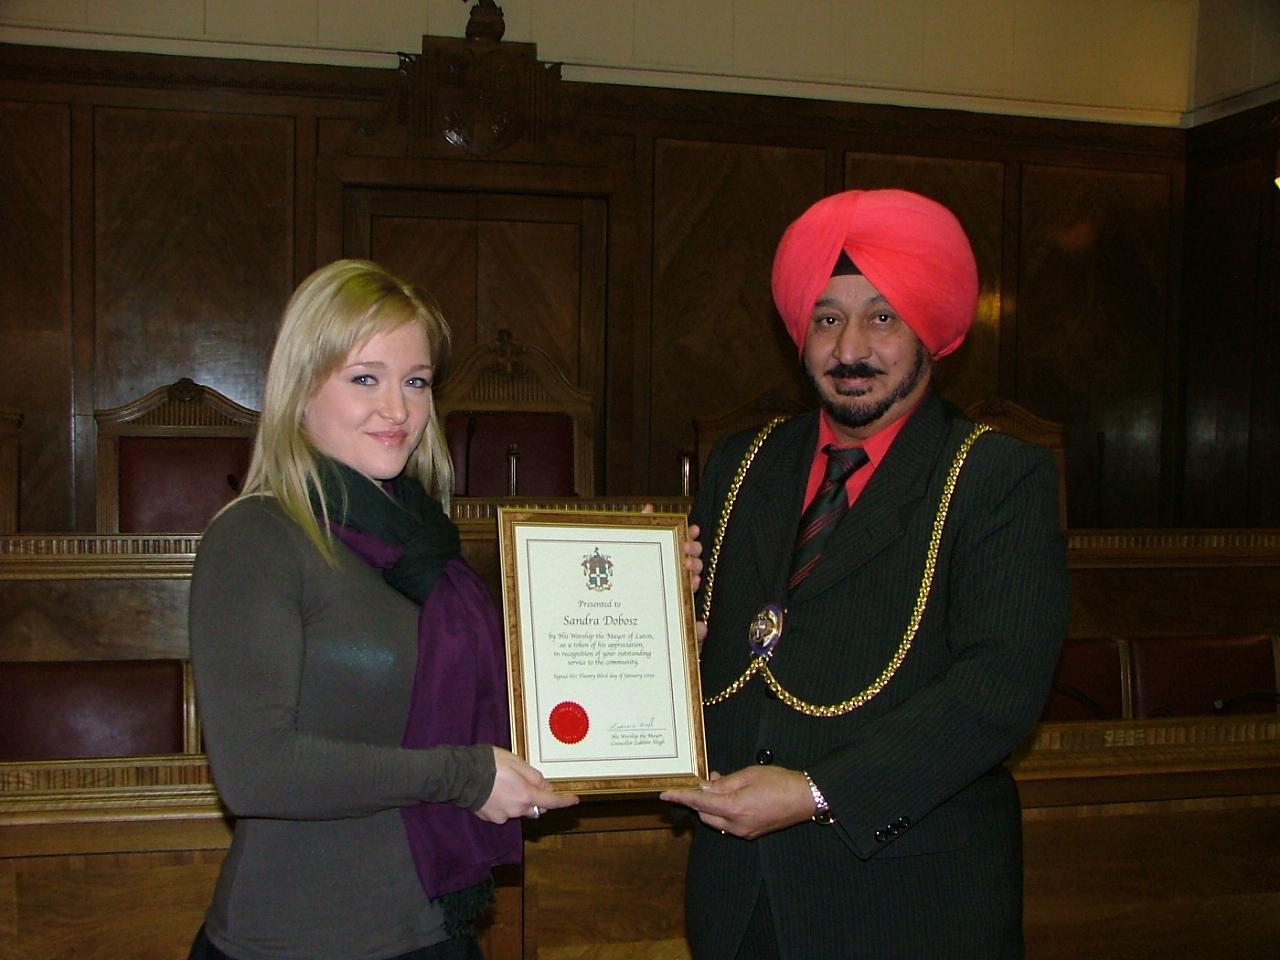 Sandra Doboz Volunteer Receives Mayor Of Luton Award